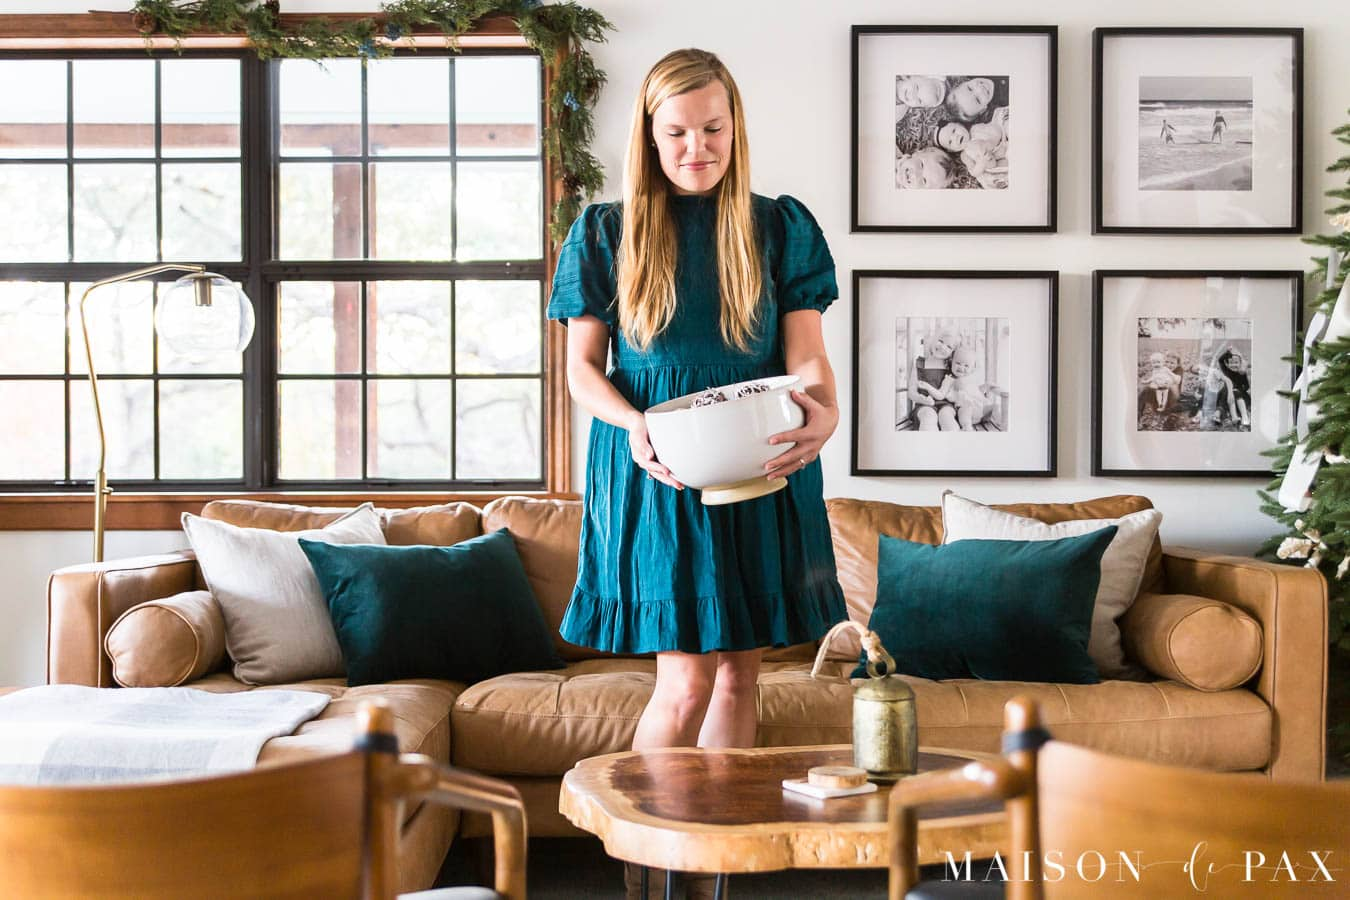 woman decorating for holidays | Maison de Pax